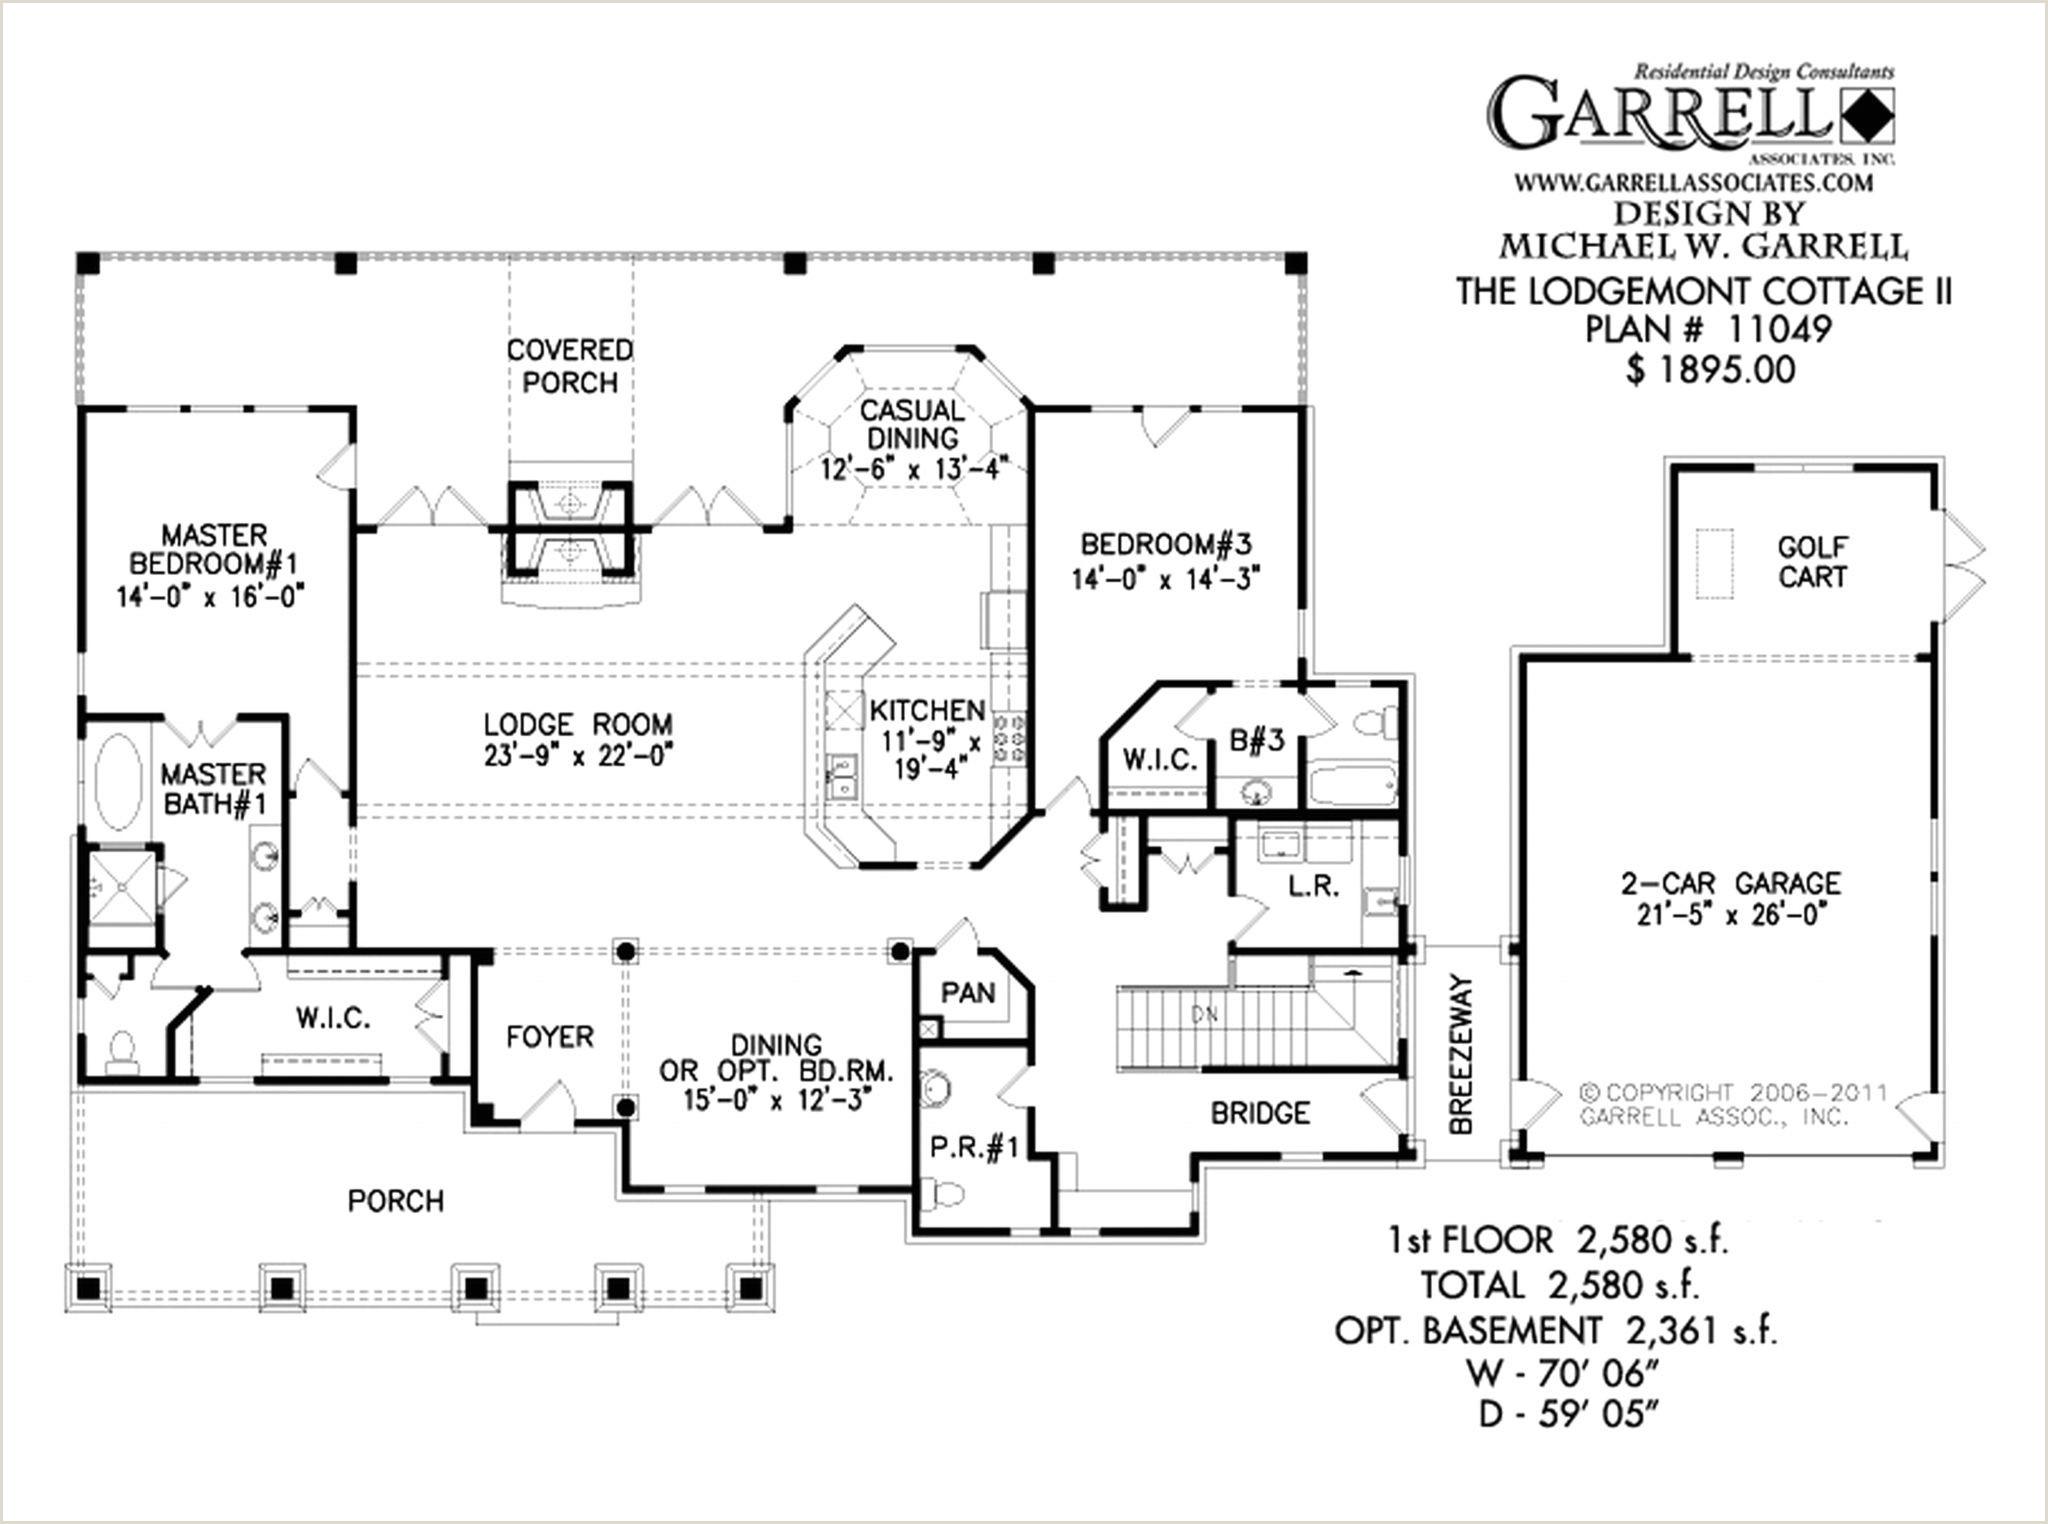 Home Depot Garage Plans